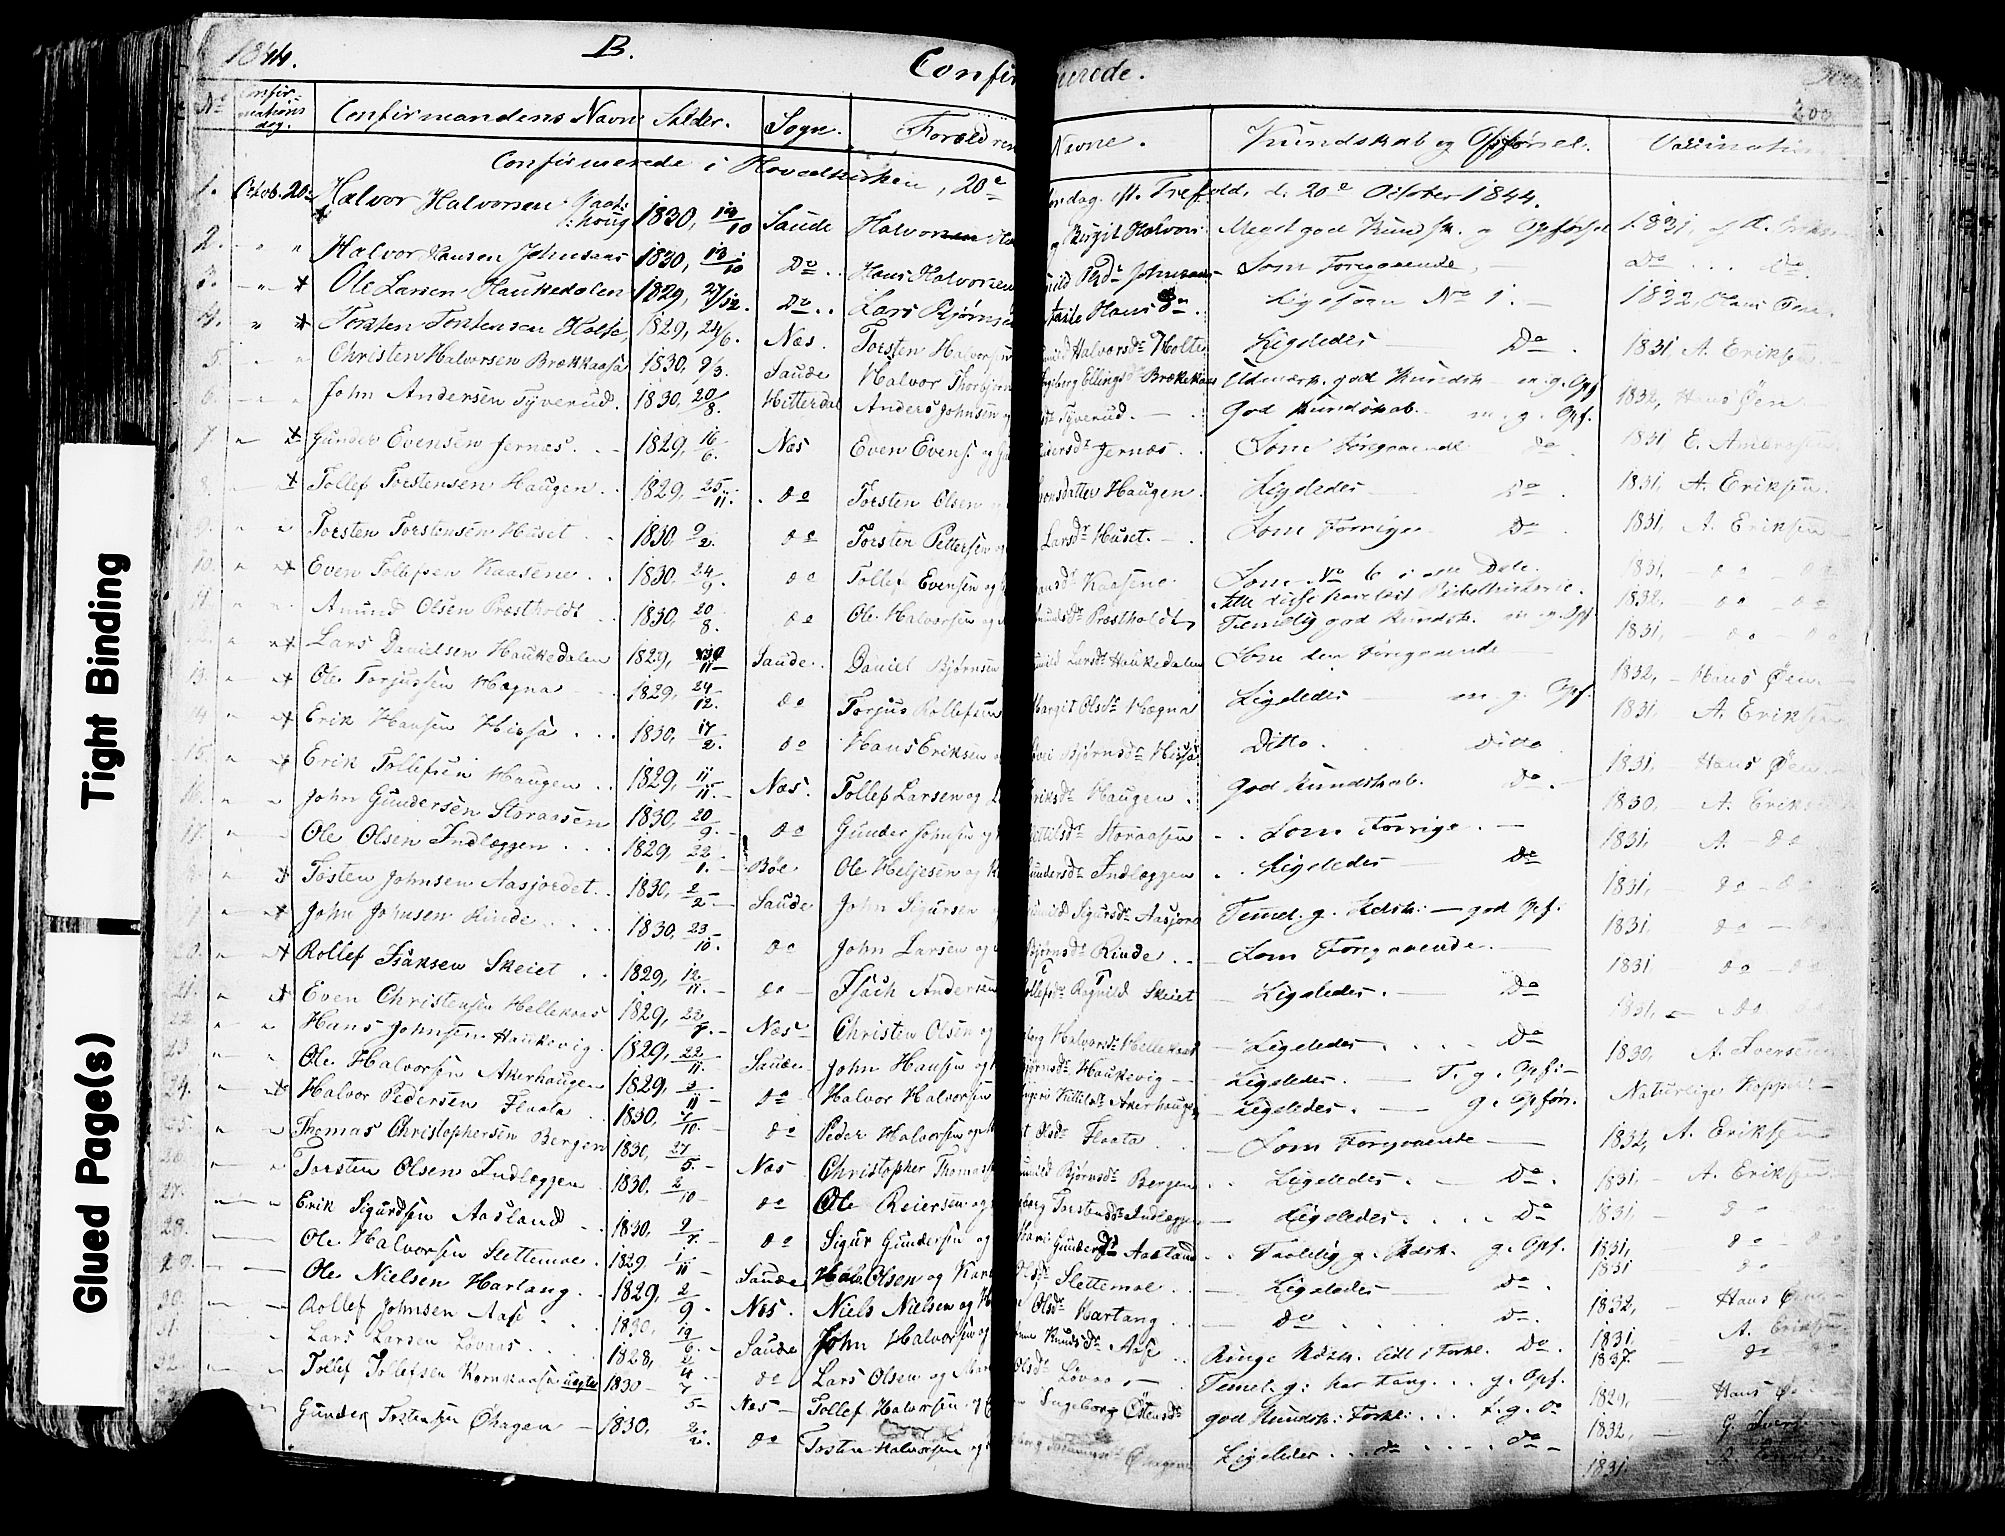 SAKO, Sauherad kirkebøker, F/Fa/L0006: Ministerialbok nr. I 6, 1827-1850, s. 200